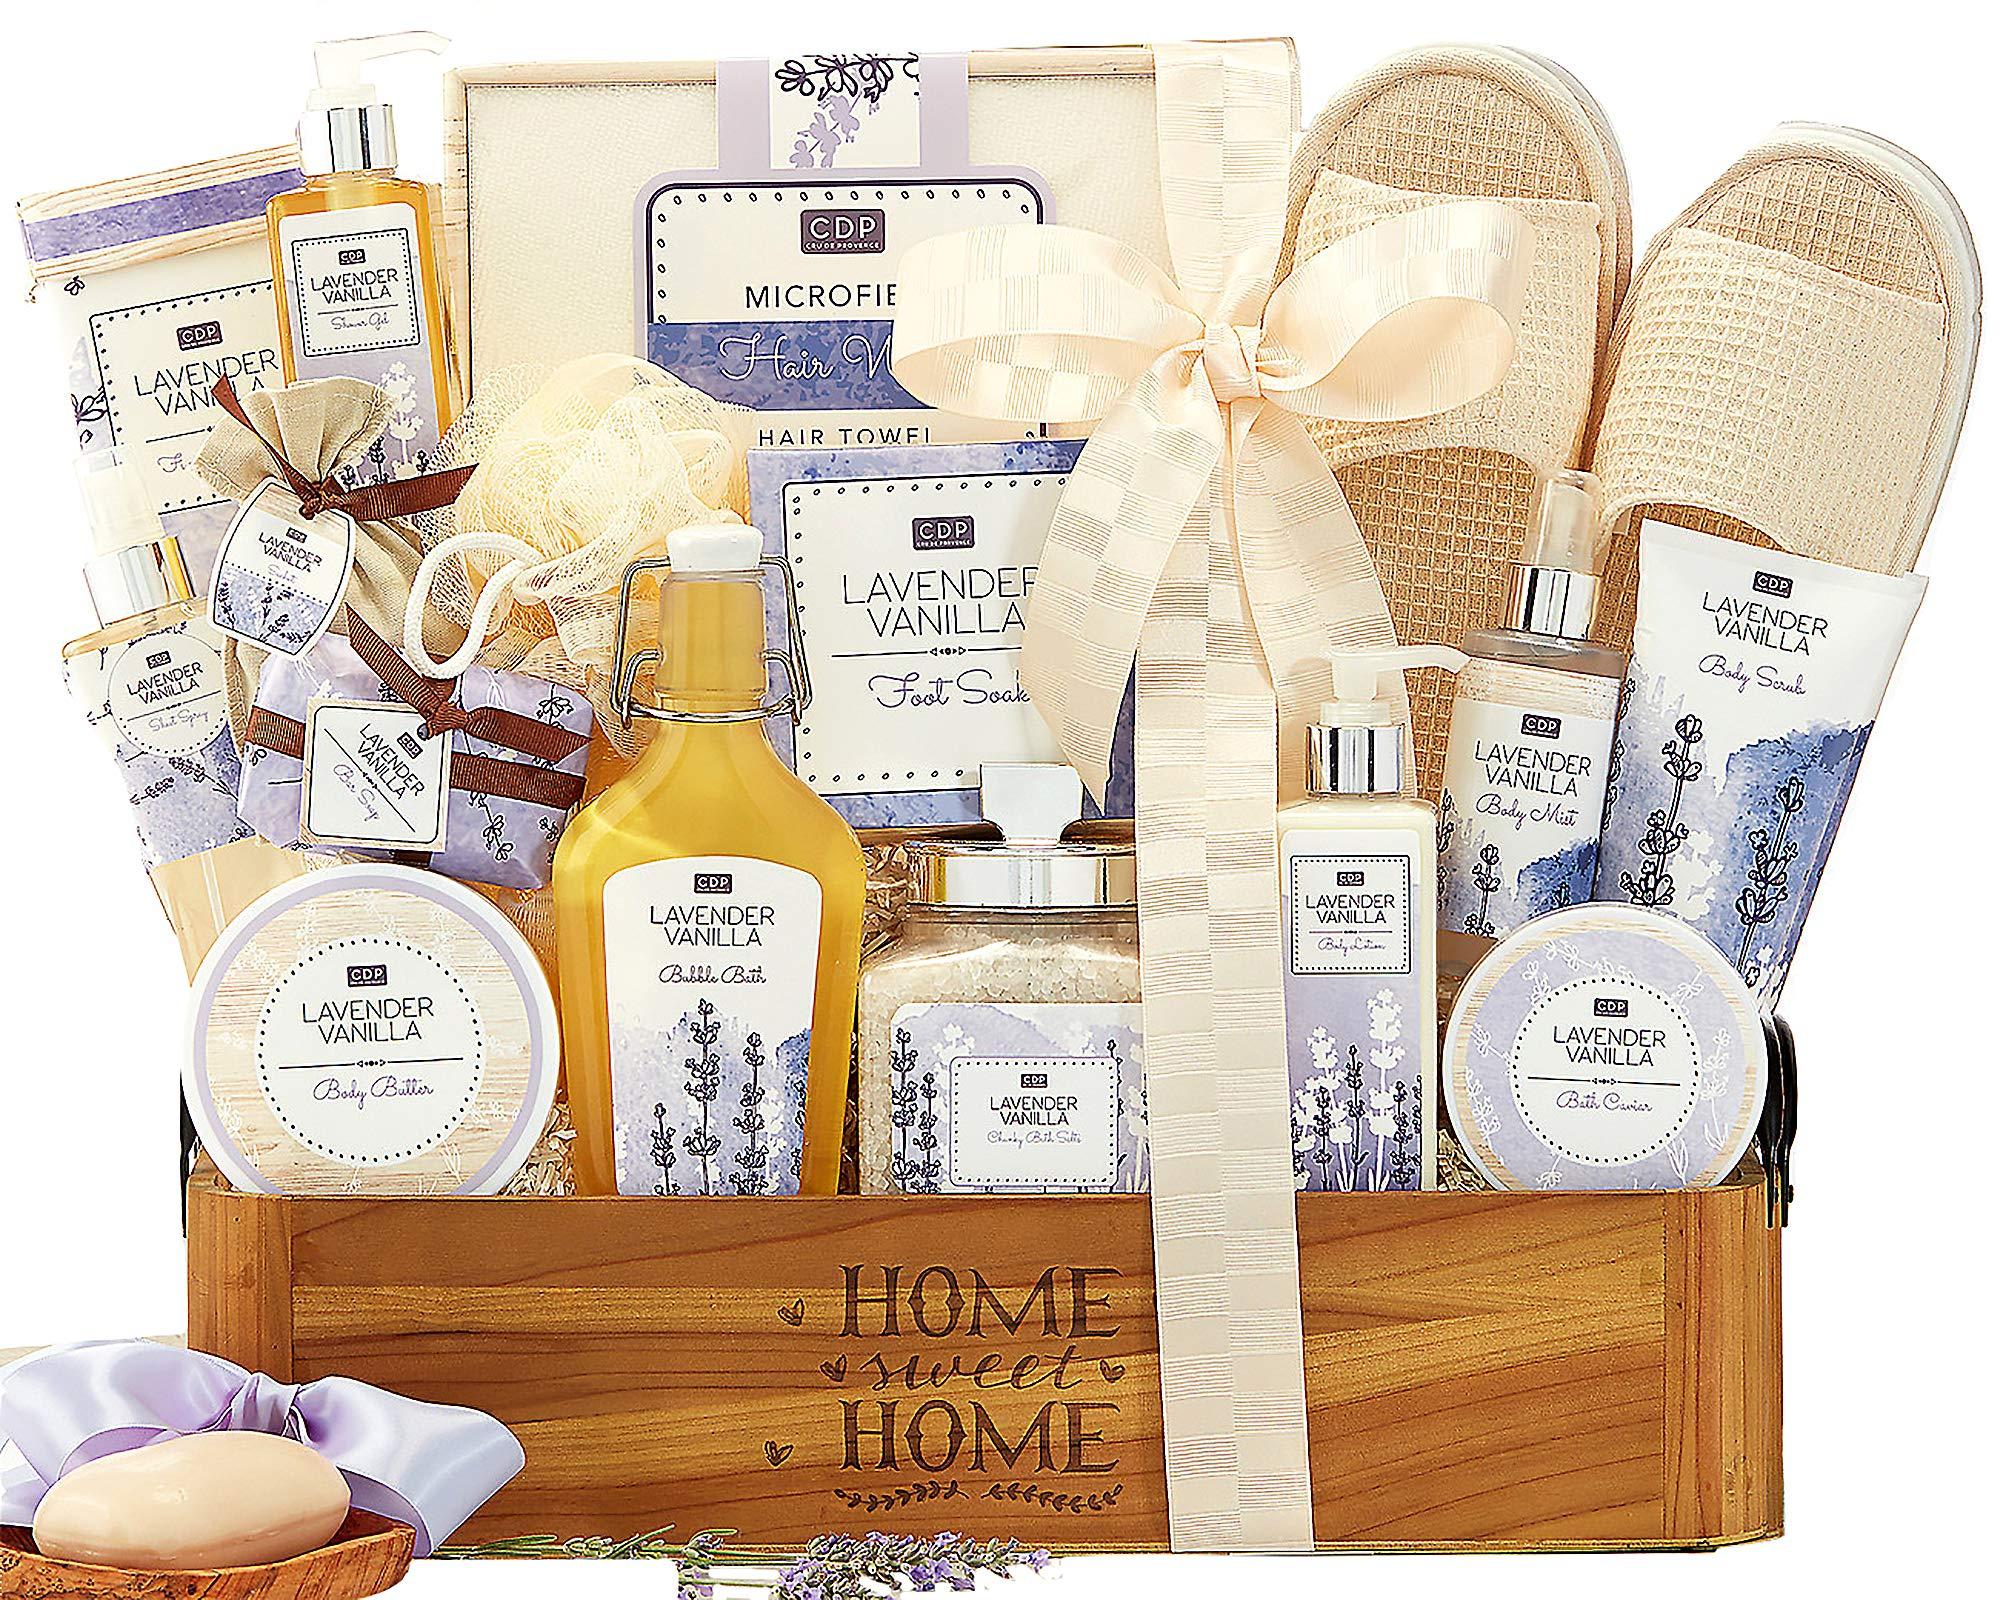 Lavender Vanilla Spa Experience Gift Basket Spa Gift Contains Bath Salts, Bath Caviar, Body Lotion, Body Scrub, Body Butter, Shower Gel, Bar Soap, Body Scrub and More !